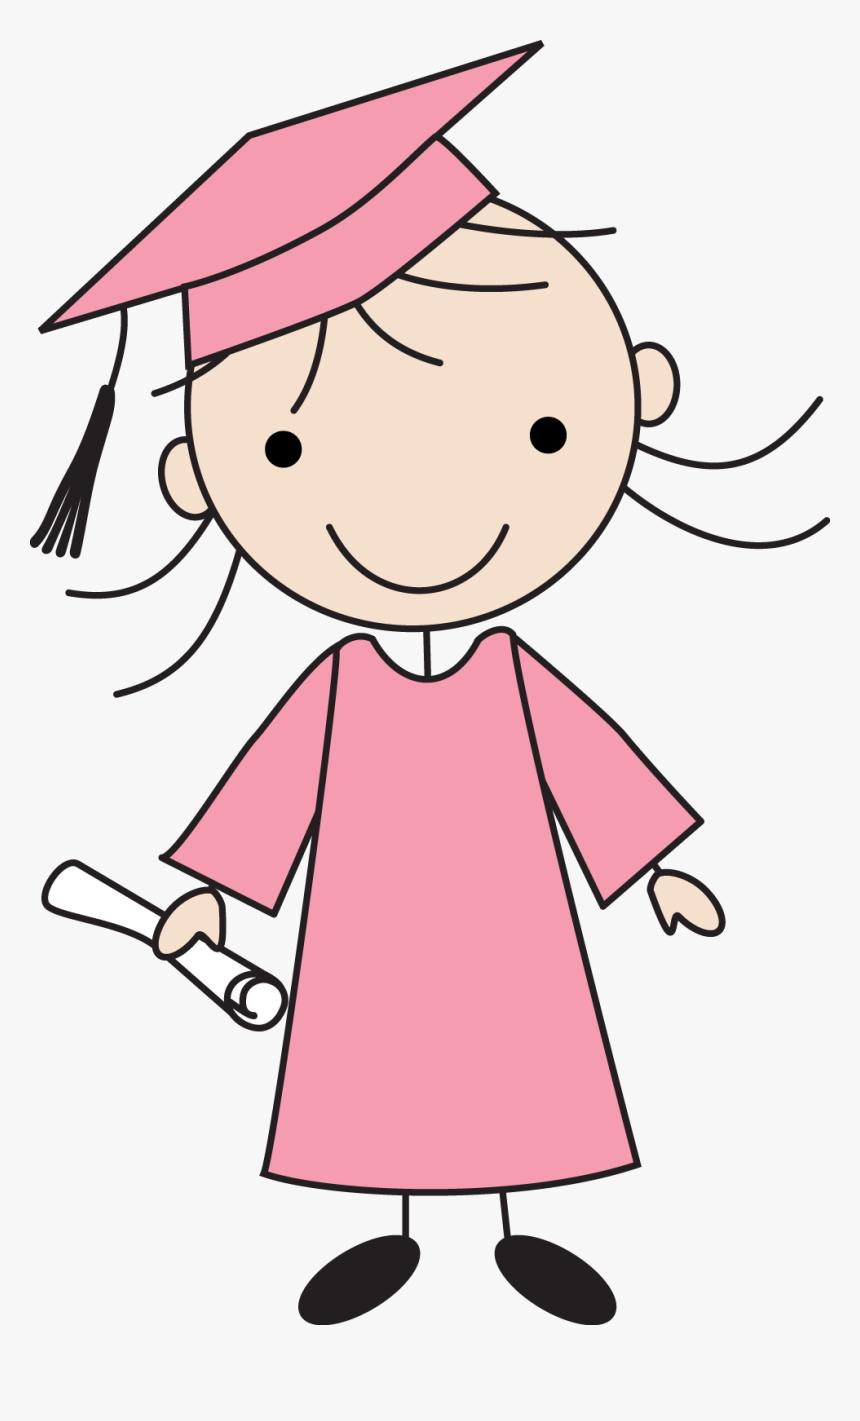 Kids Drawings Of Graduation, HD Png Download, Free Download